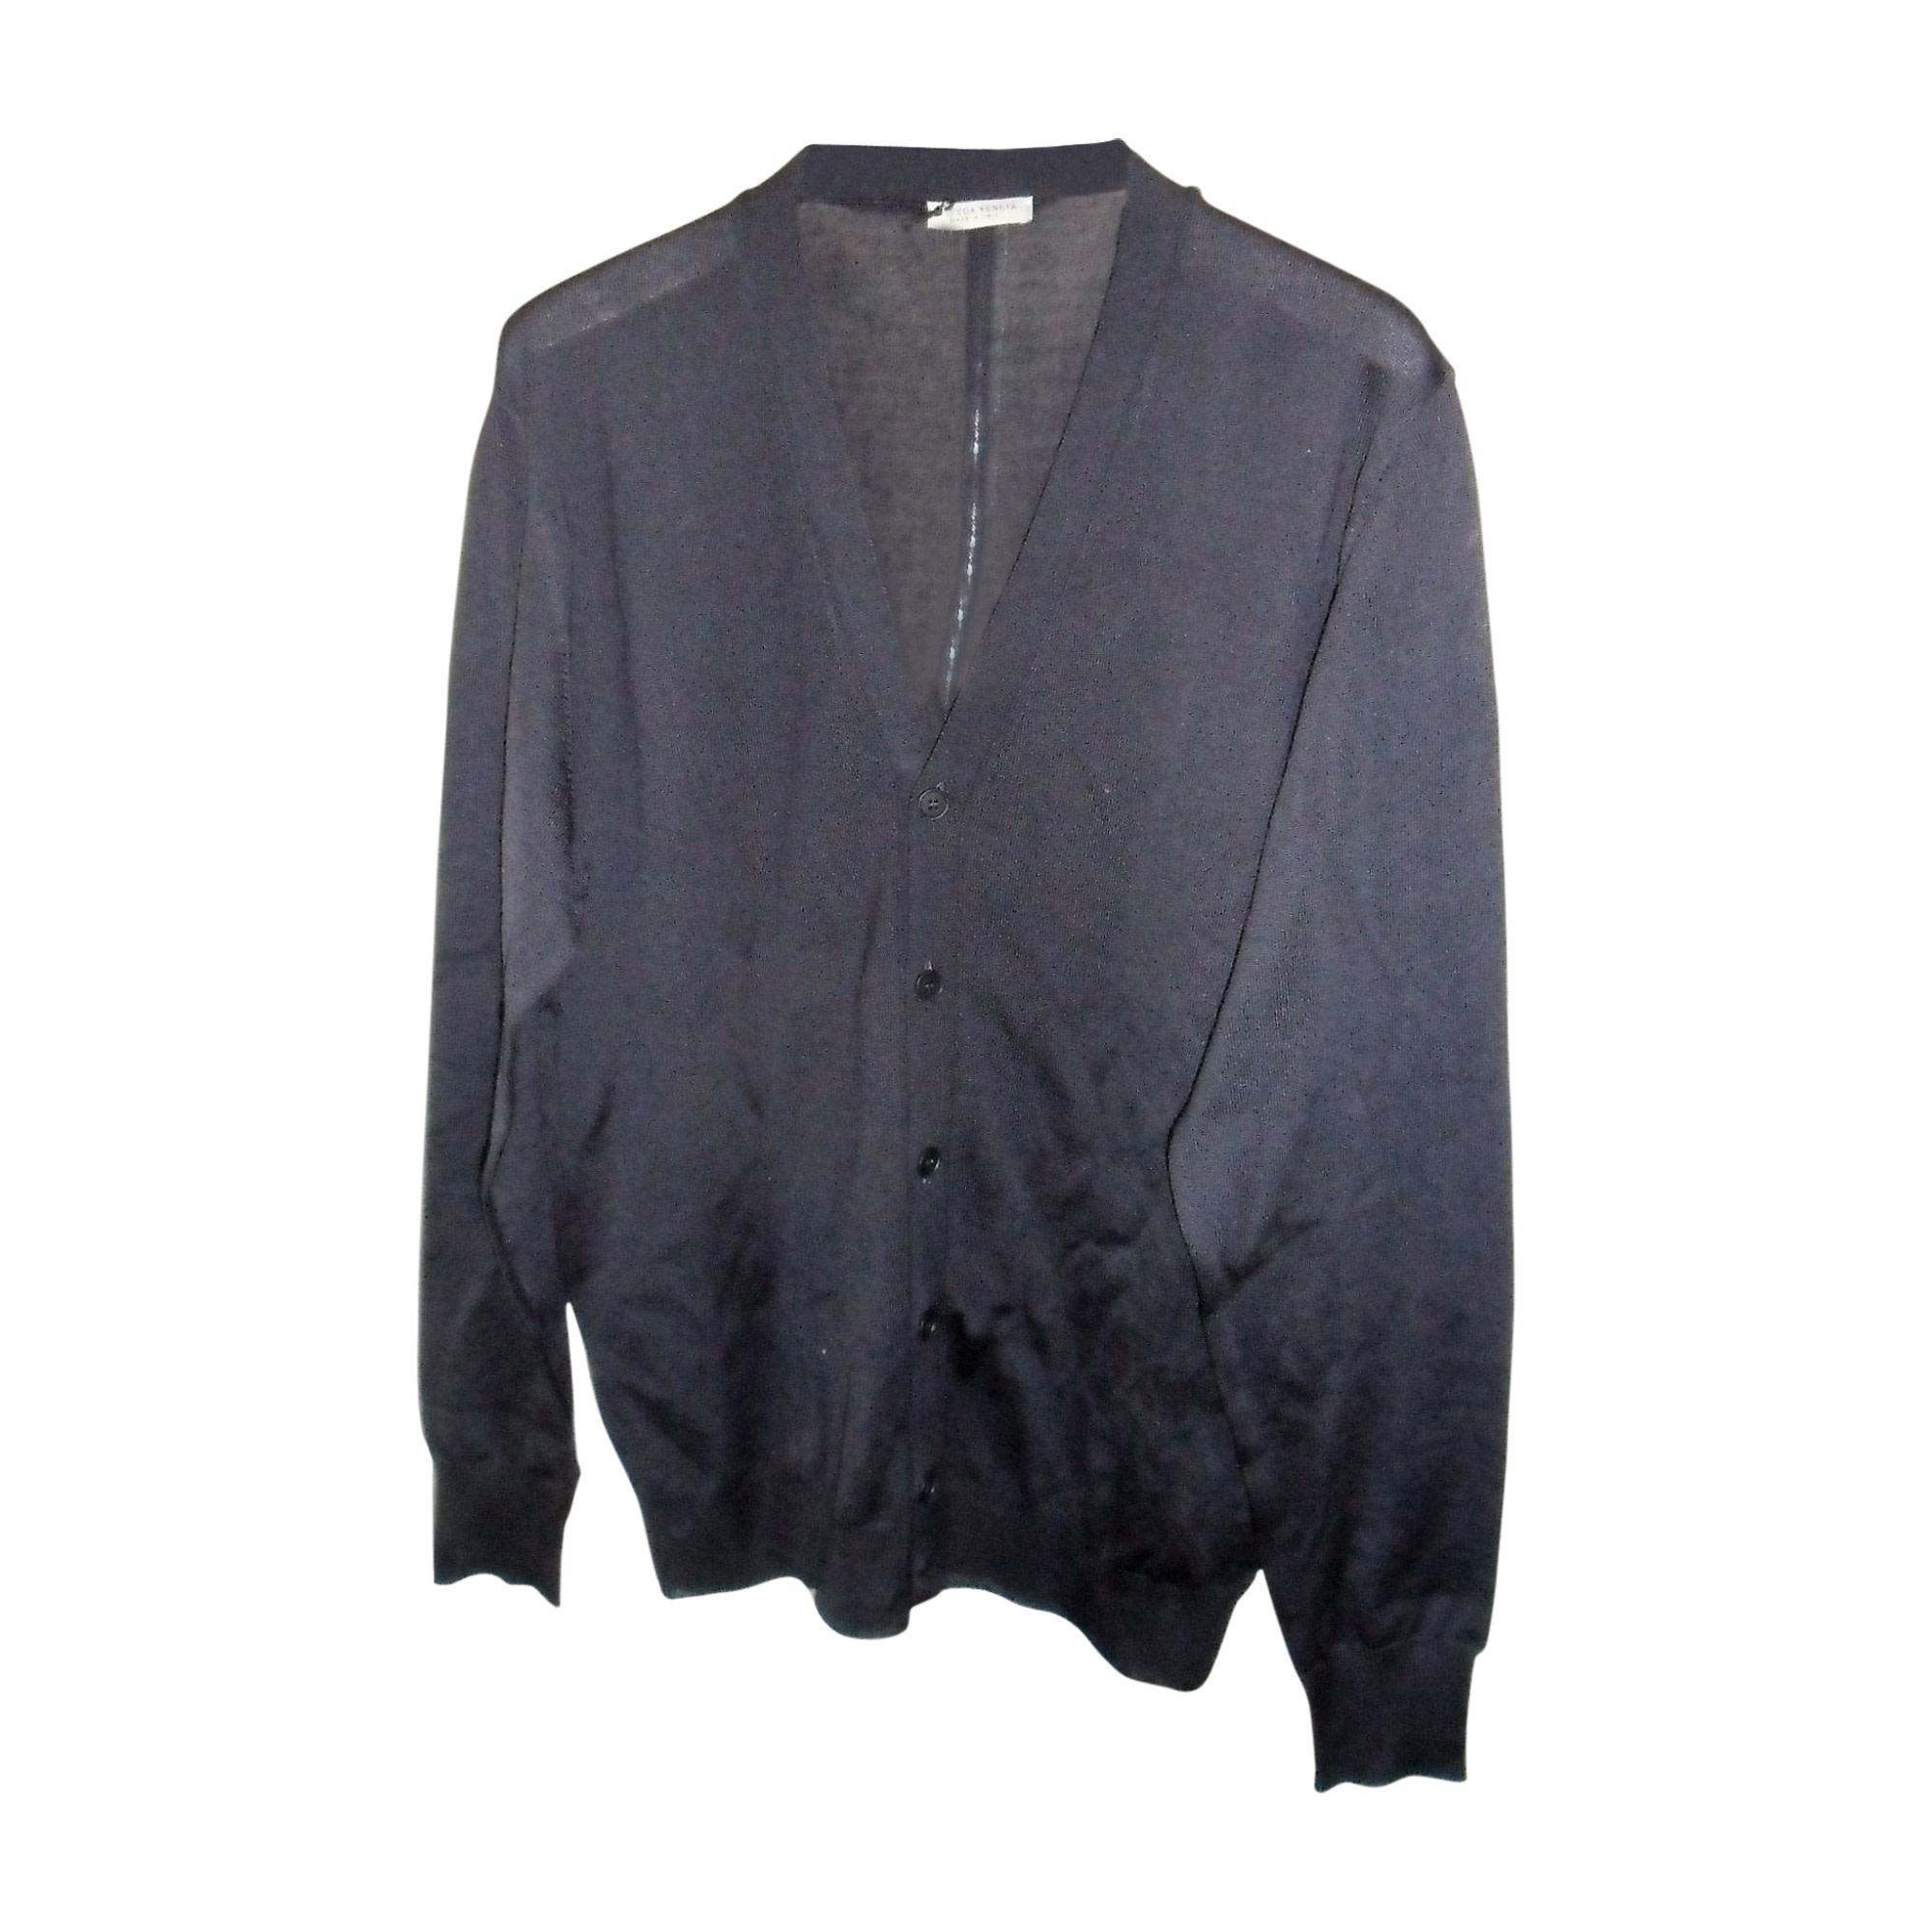 Vest, Cardigan BOTTEGA VENETA Blue, navy, turquoise